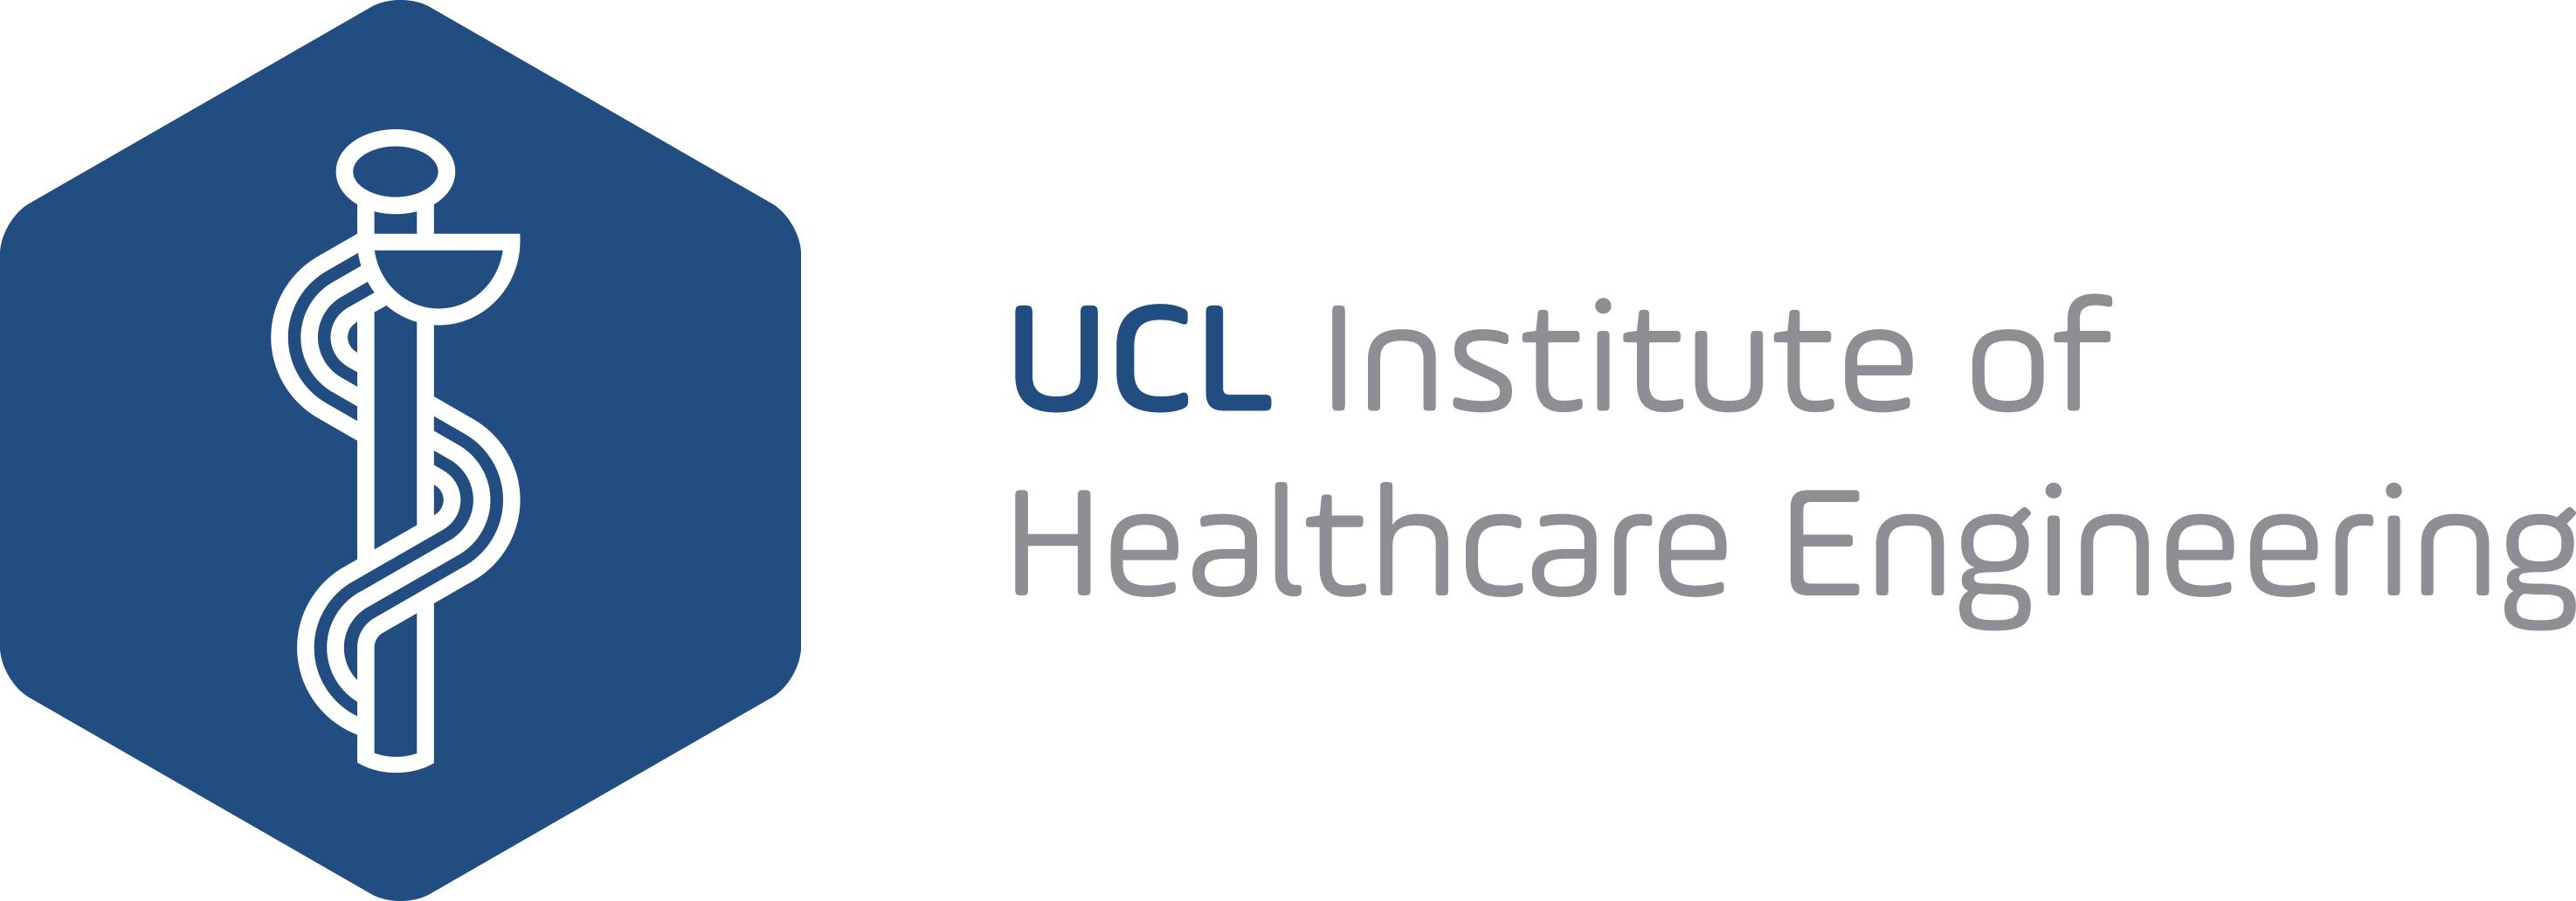 UCL Institute of Healthcare Engineering